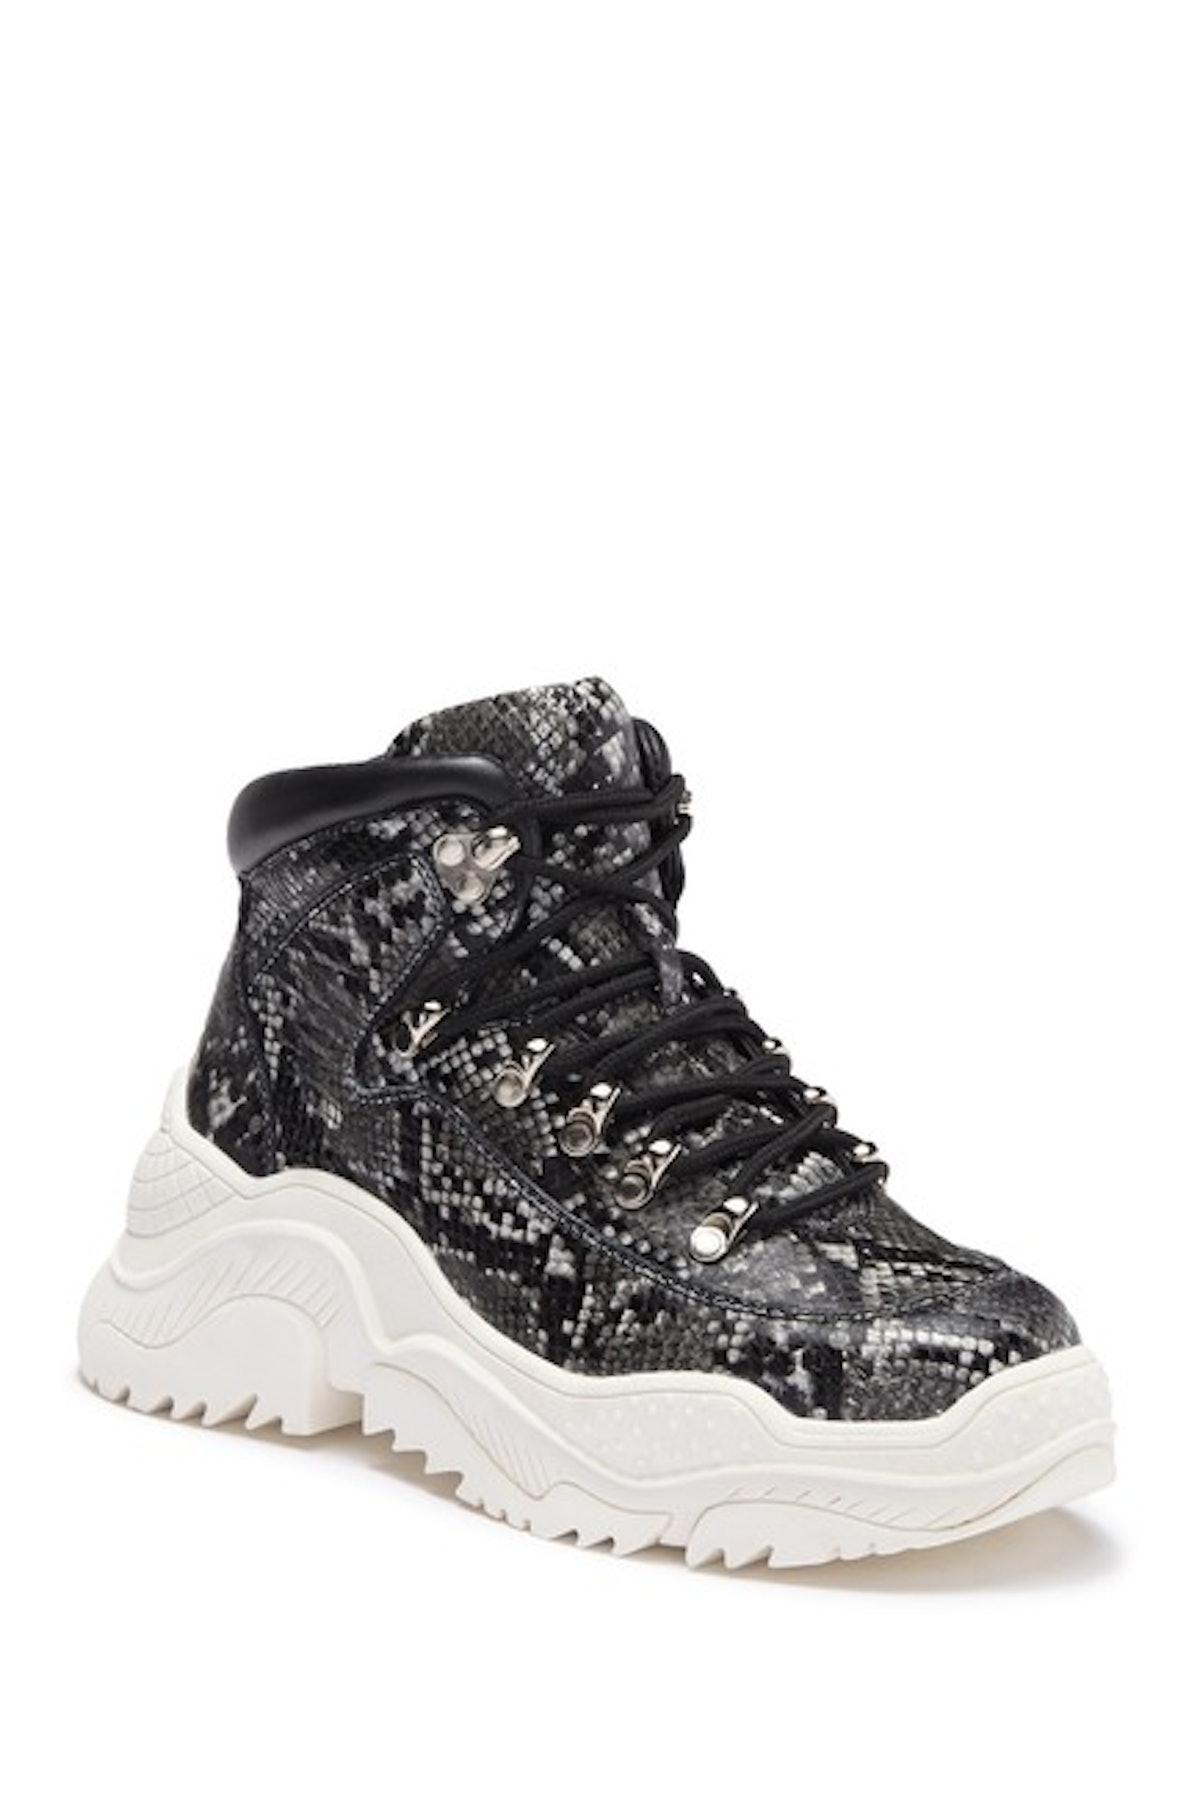 Debris Sneaker Boot